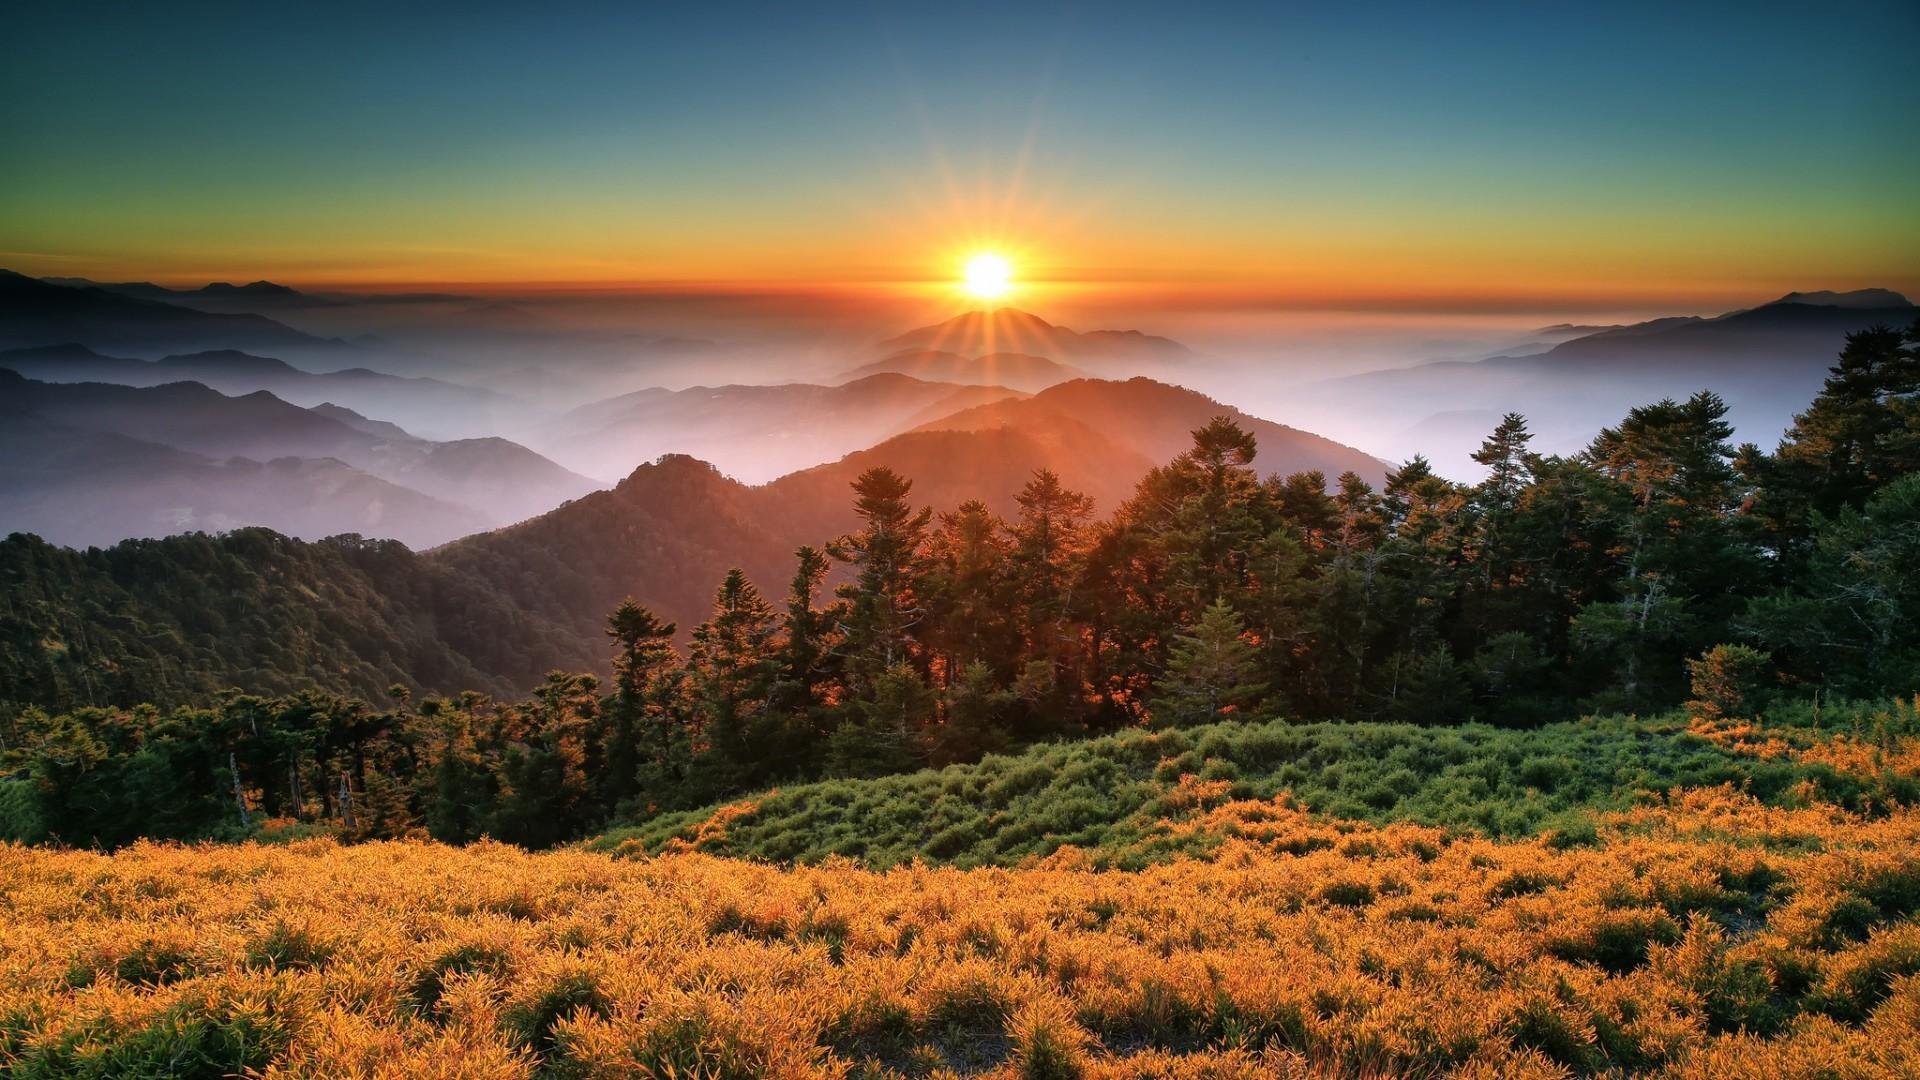 Preview wallpaper taroko national park, china, china, taiwan, sunset,  mountains,